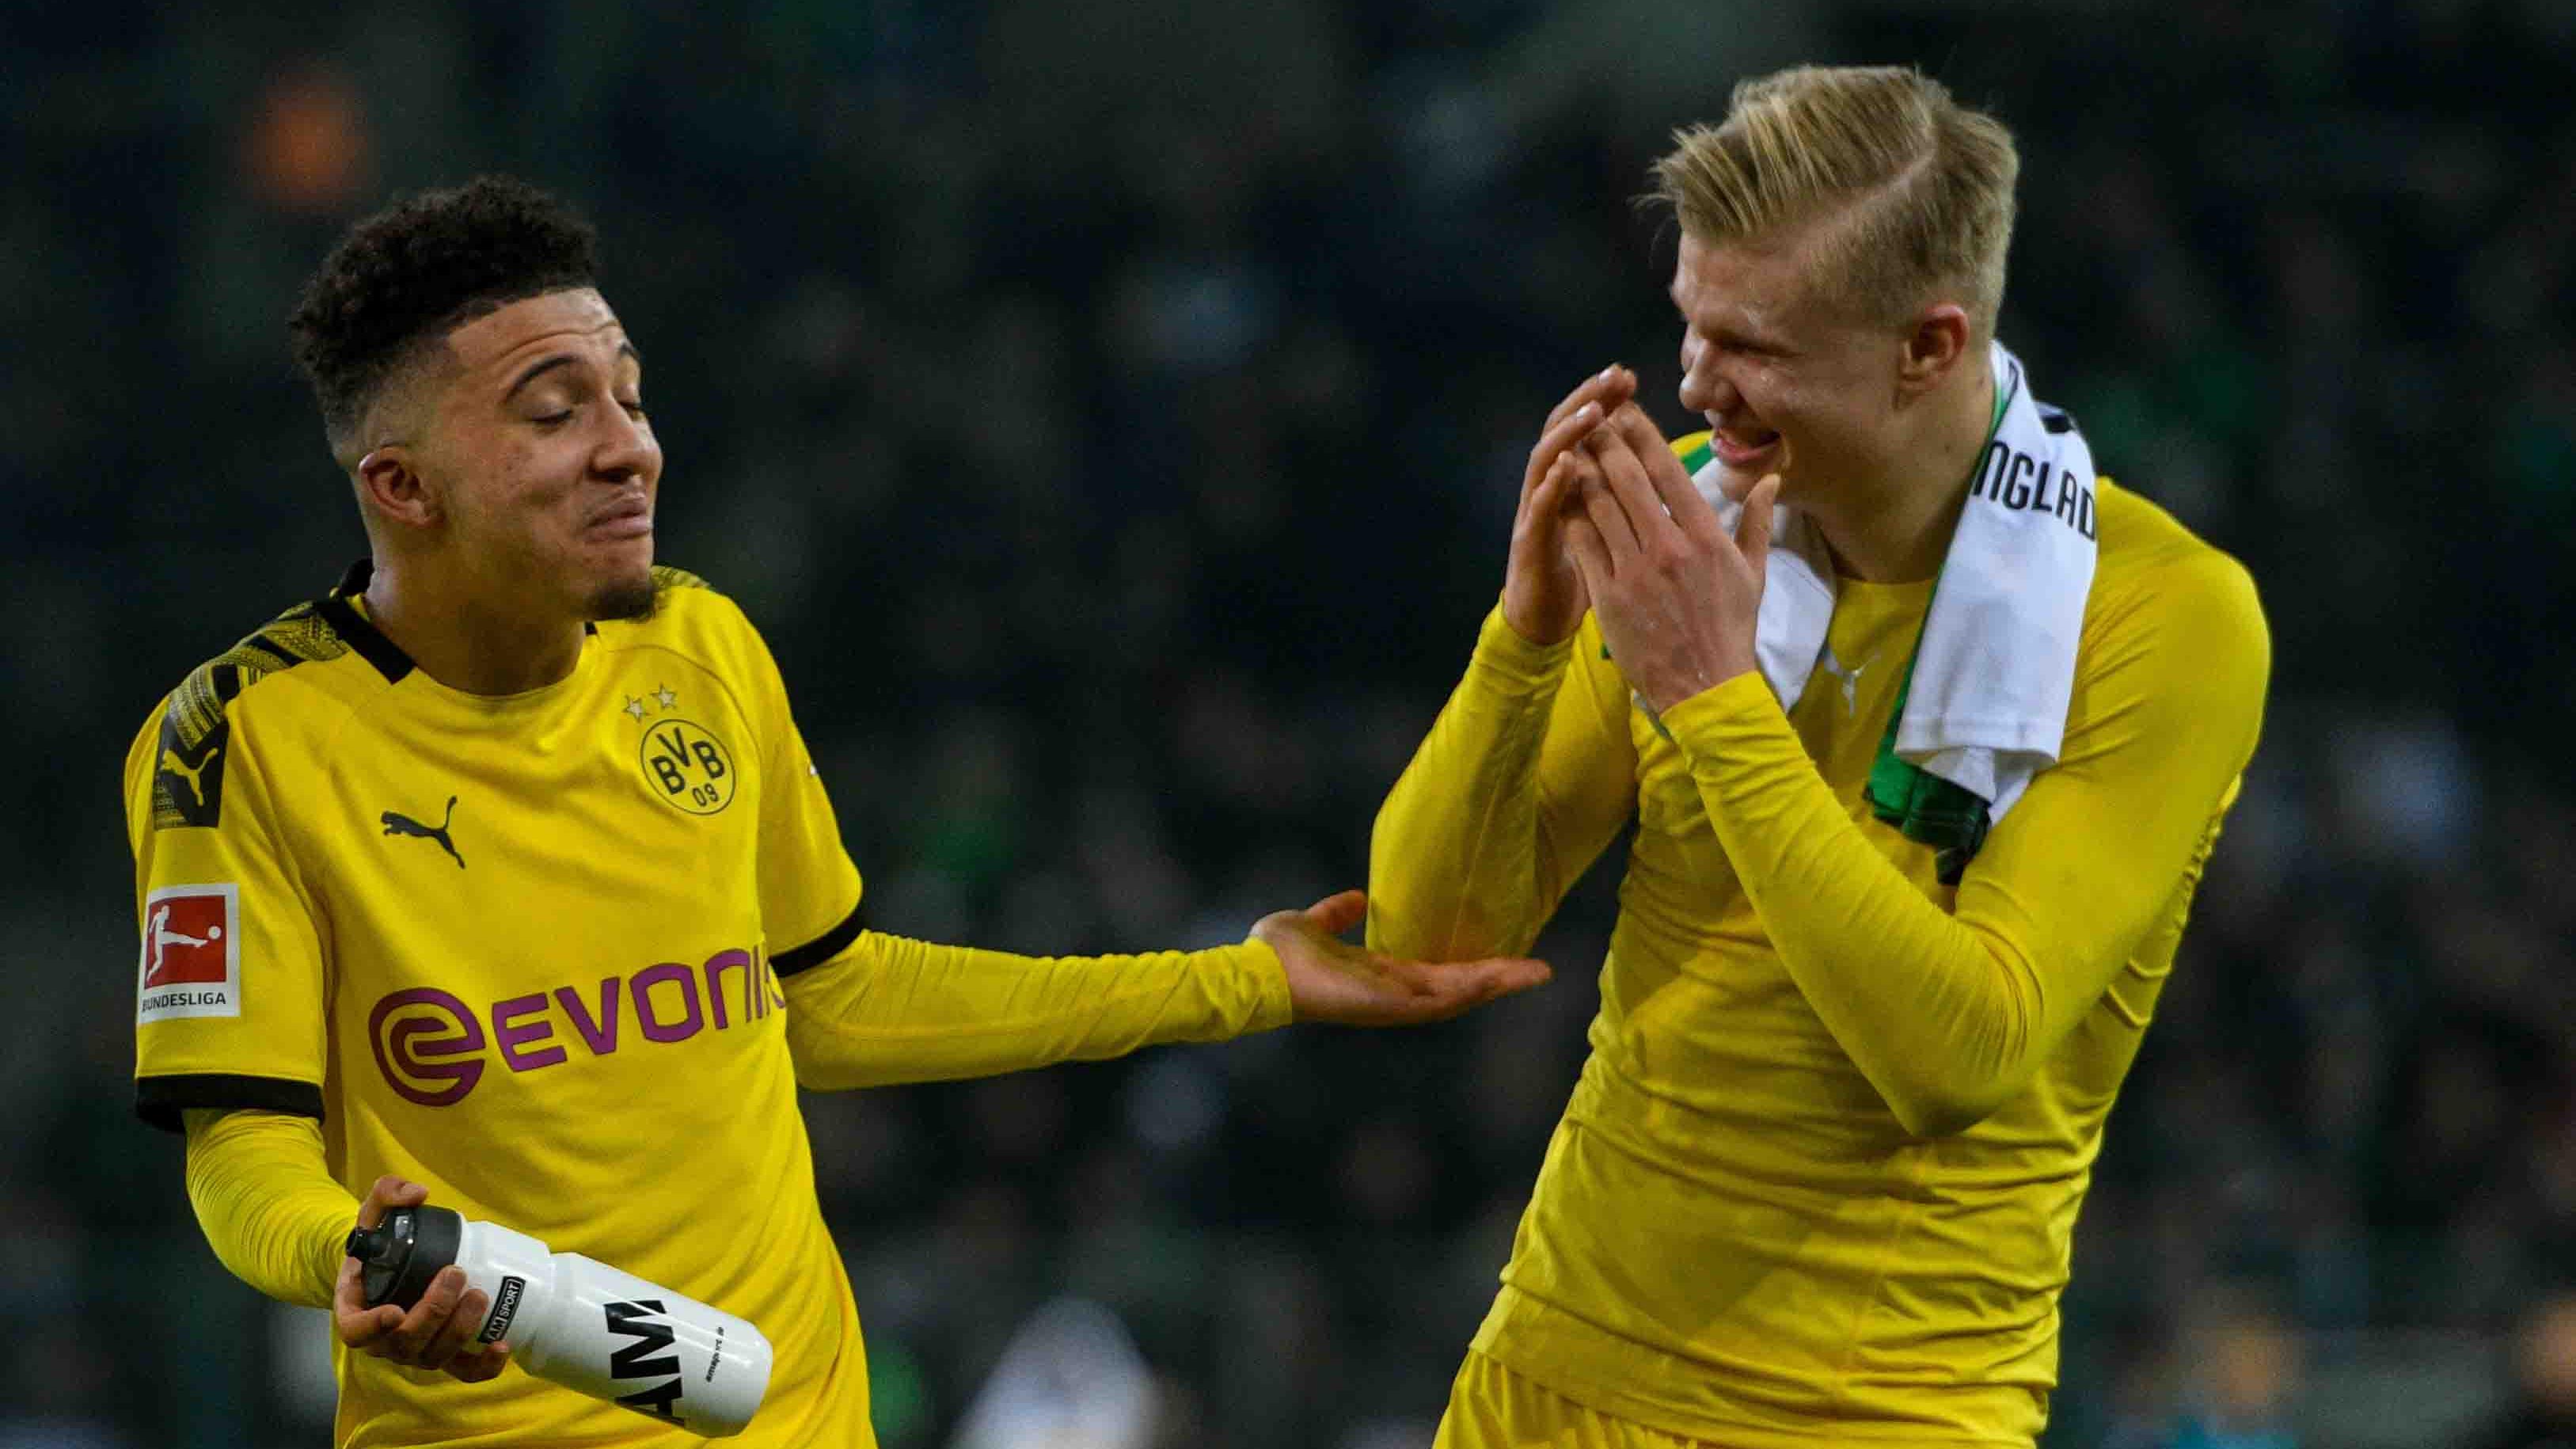 No reason why Haaland & Sancho should leave Dortmund, says former keeper Langerak